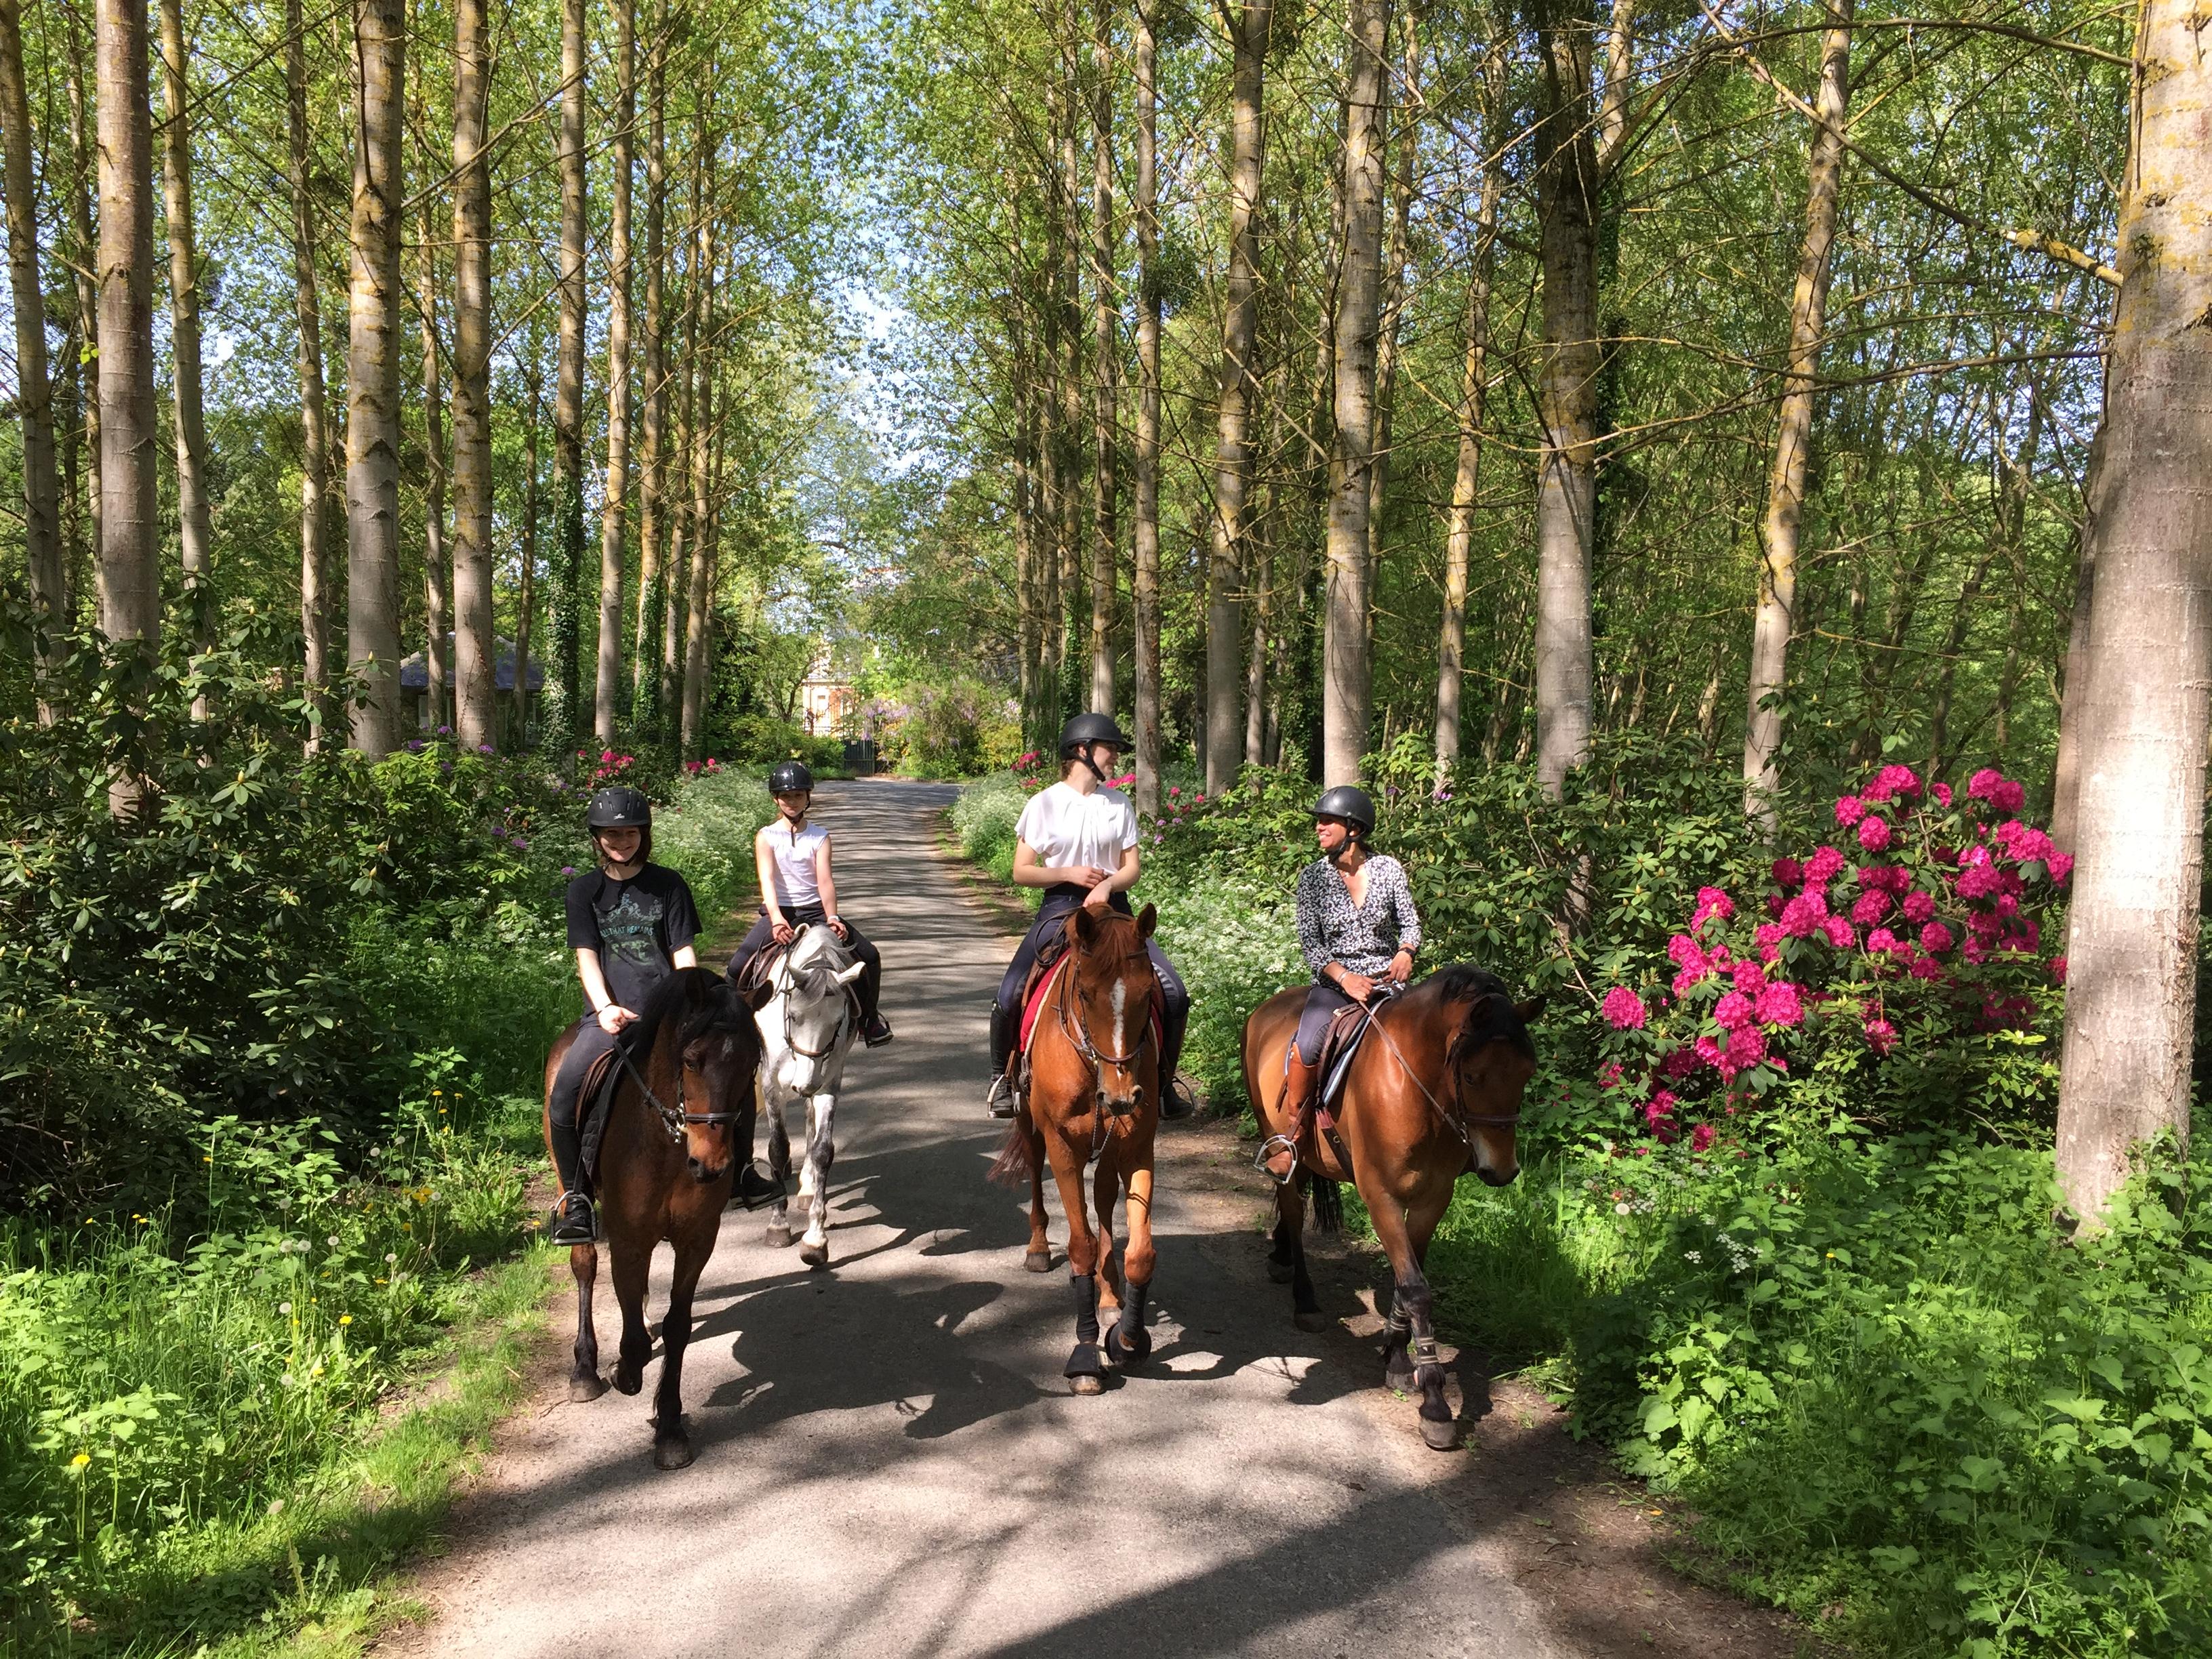 Balade a cheval en foret de rambouillet galluis 78 equitation we